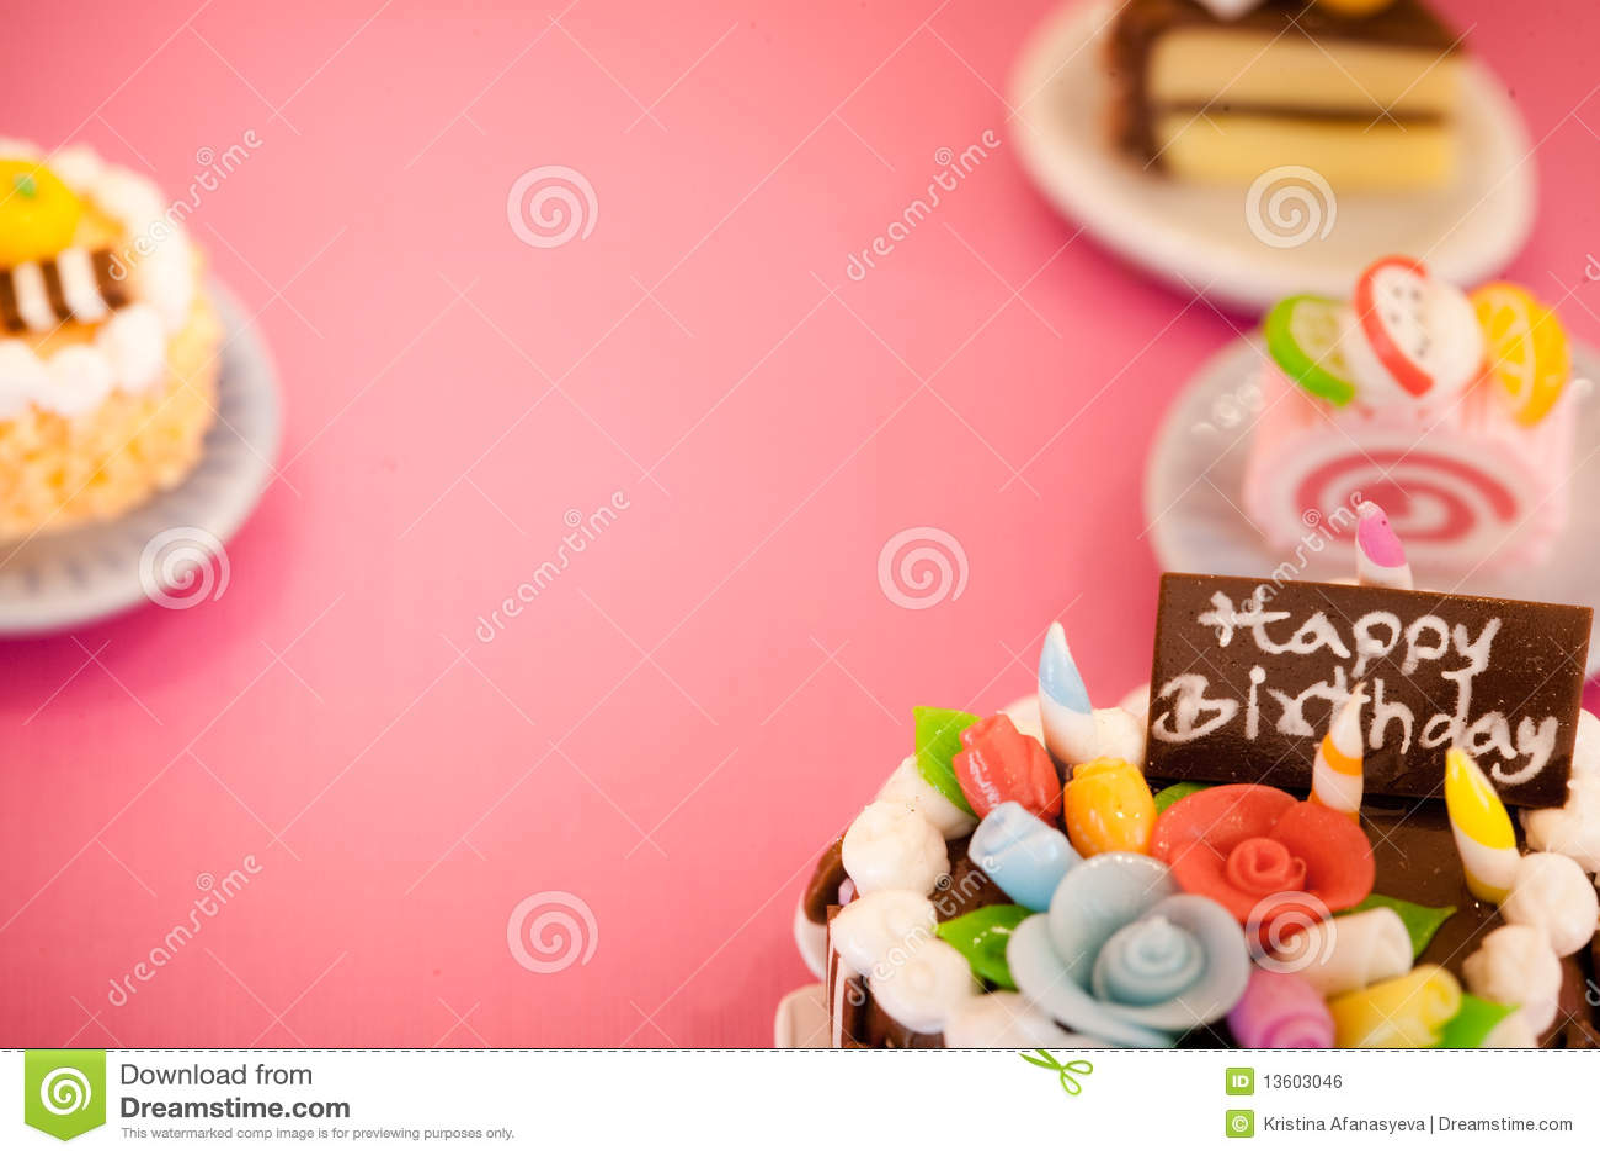 Birthday cakes background stock photo. Image of colorful ...